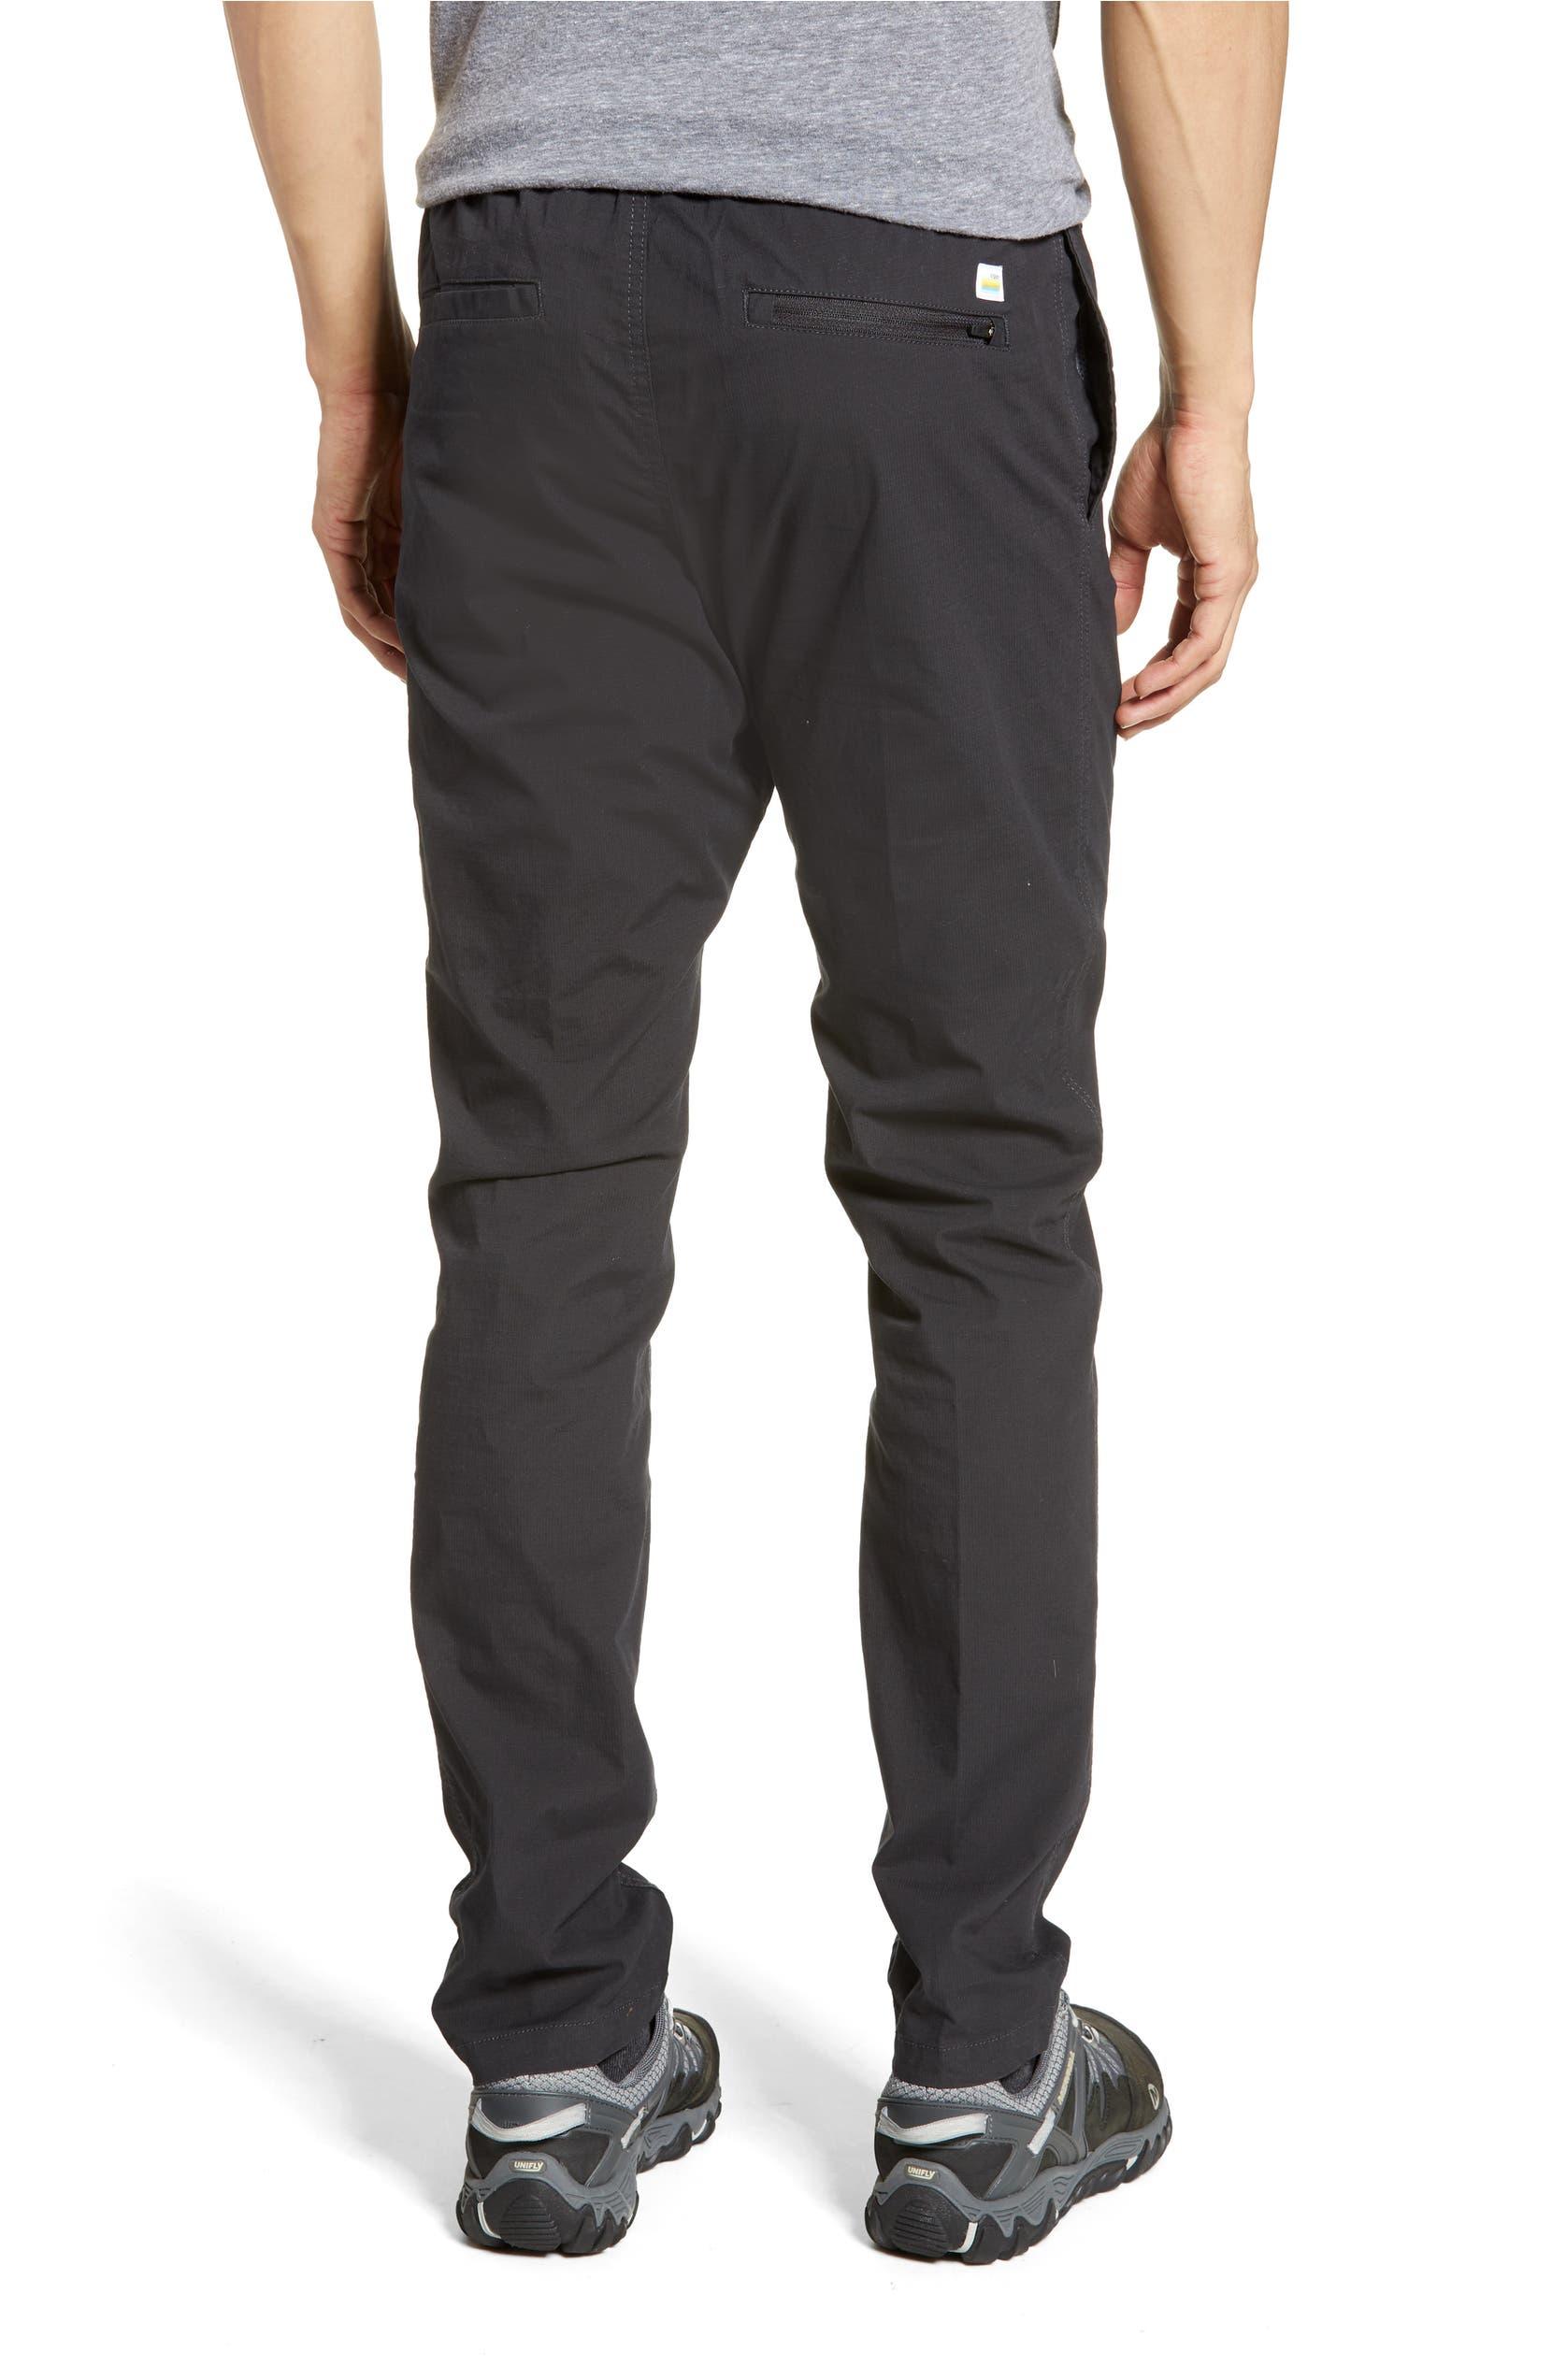 9d53208d99930 vuori Ripstop Slim Fit Climber Pants | Nordstrom